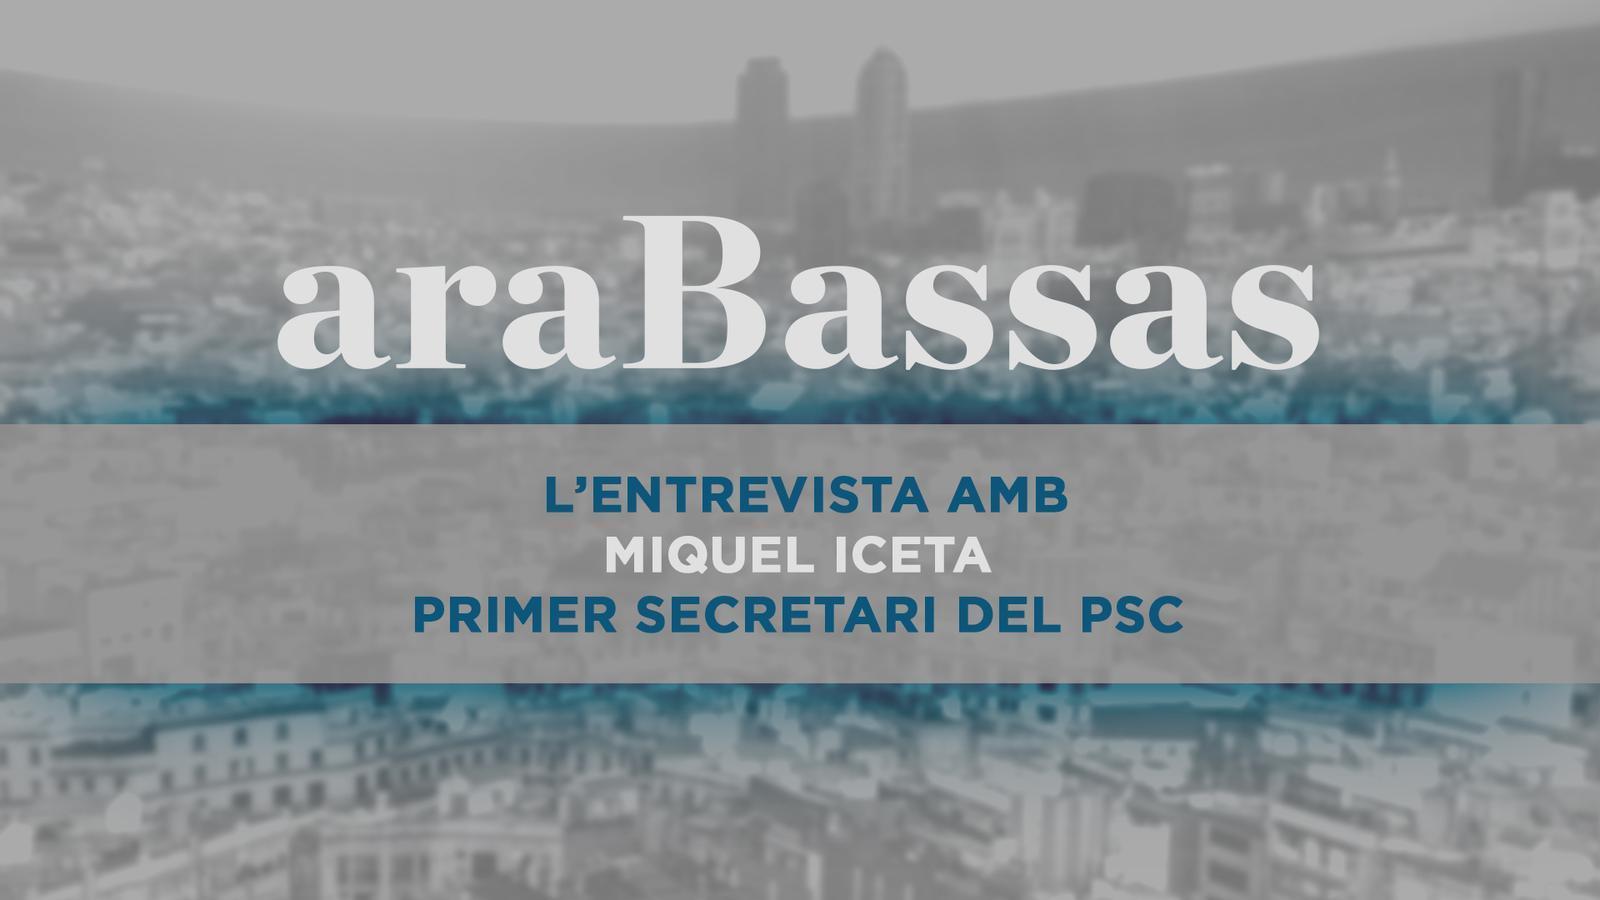 Entrevista d'Antoni Bassas a Miquel Iceta